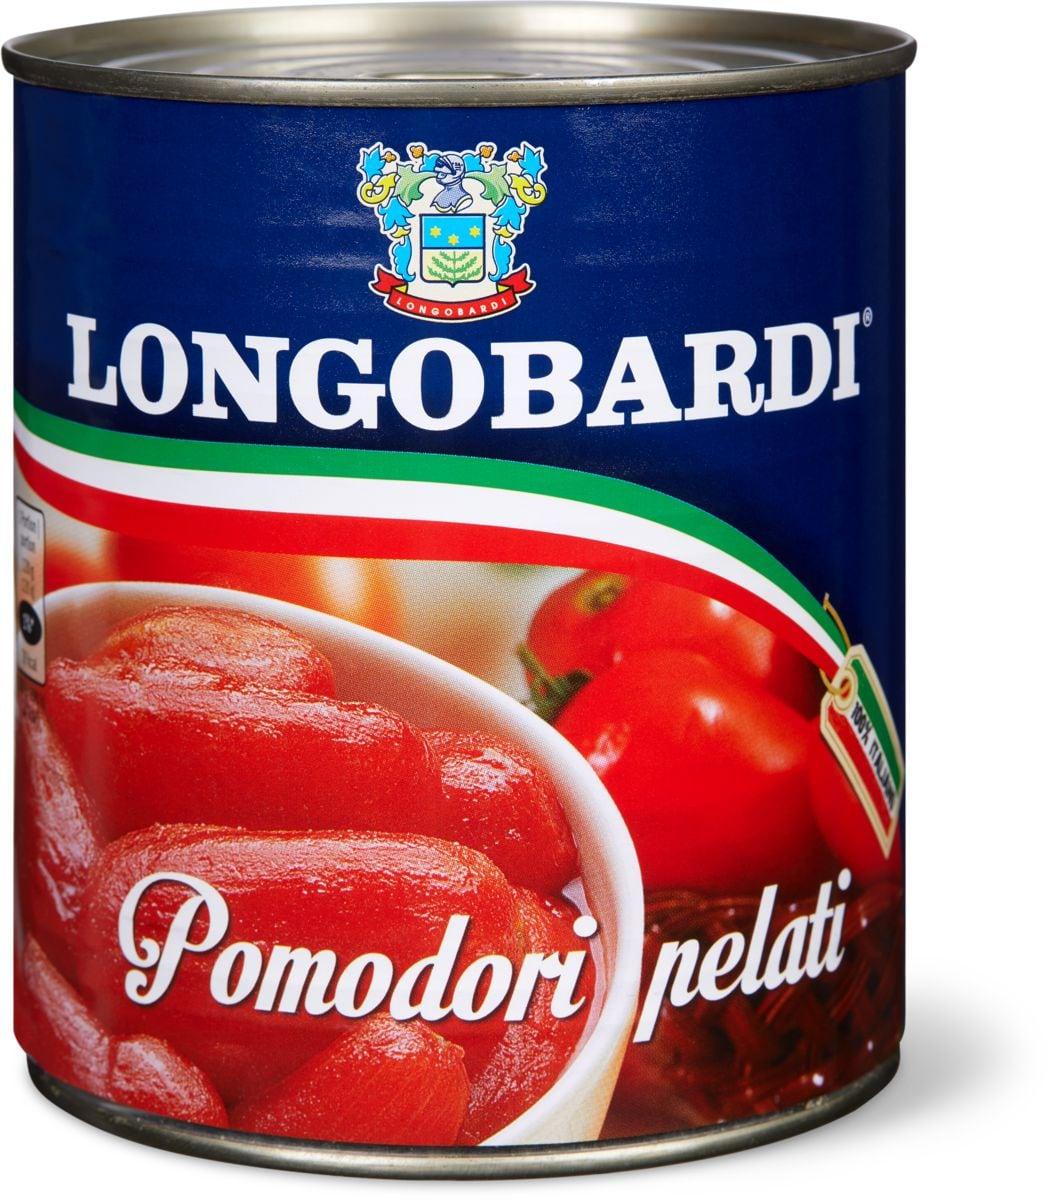 Longobardi Pomodori pelati